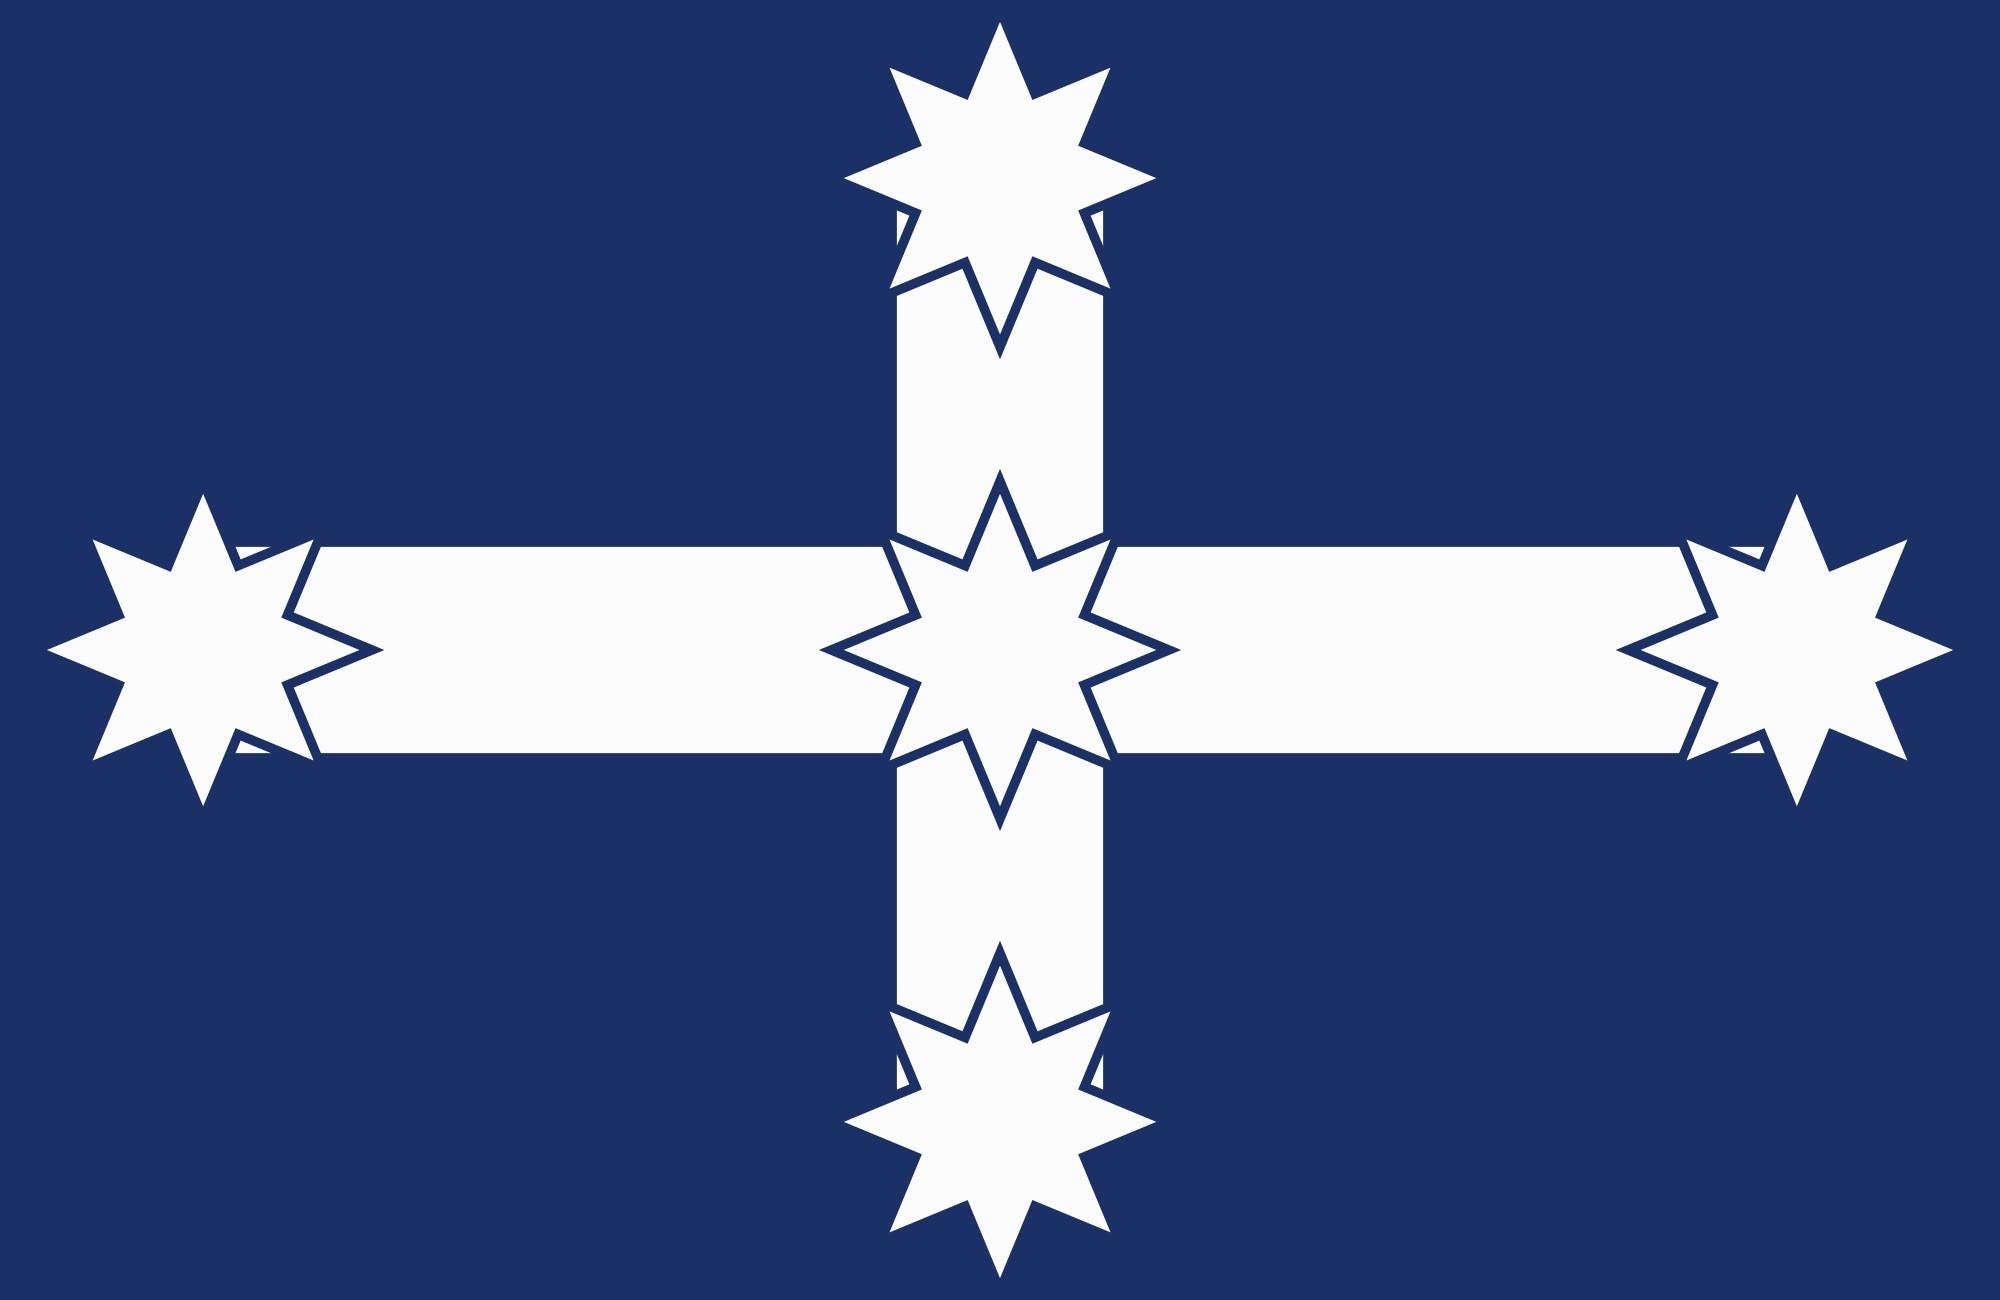 2000x1300 Rebel Flag Wallpapers Luxury Australien – Photos Of 32 Unique Rebel Flag Wallpapers Photos